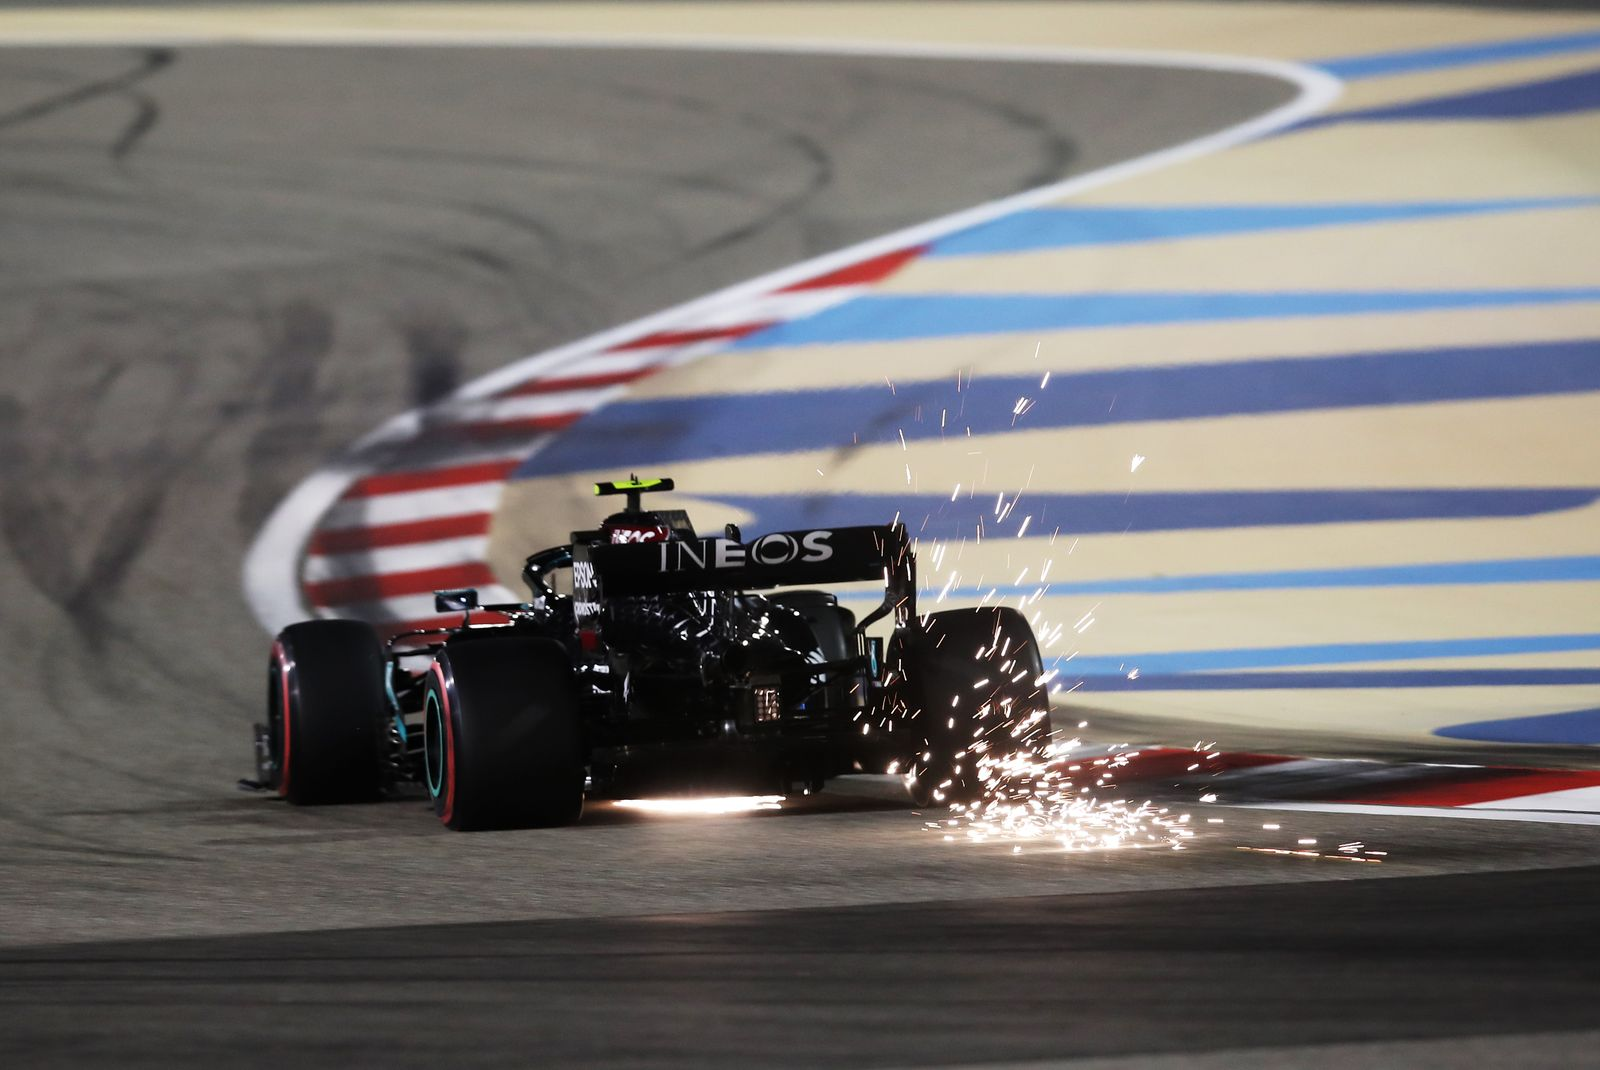 F1 Grand Prix of Sakhir - Final Practice